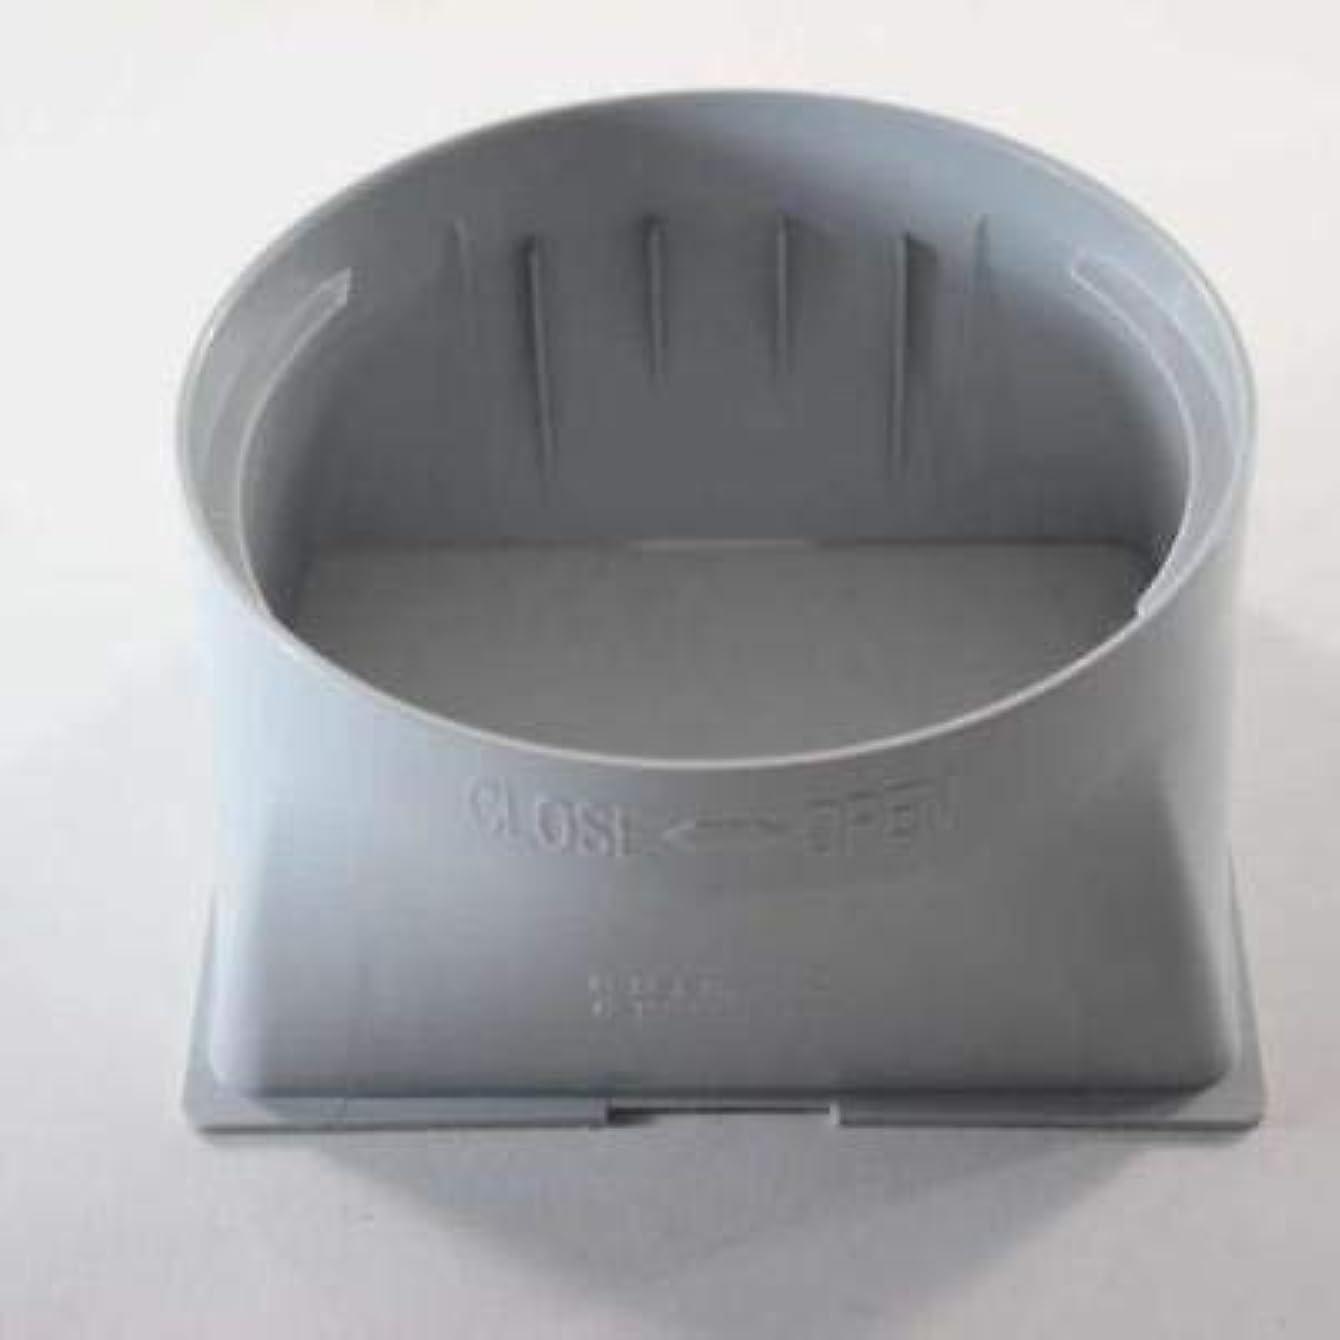 TKW Square to Round Portable A/C Adaptor Fits Hisense mommfvshbionw56